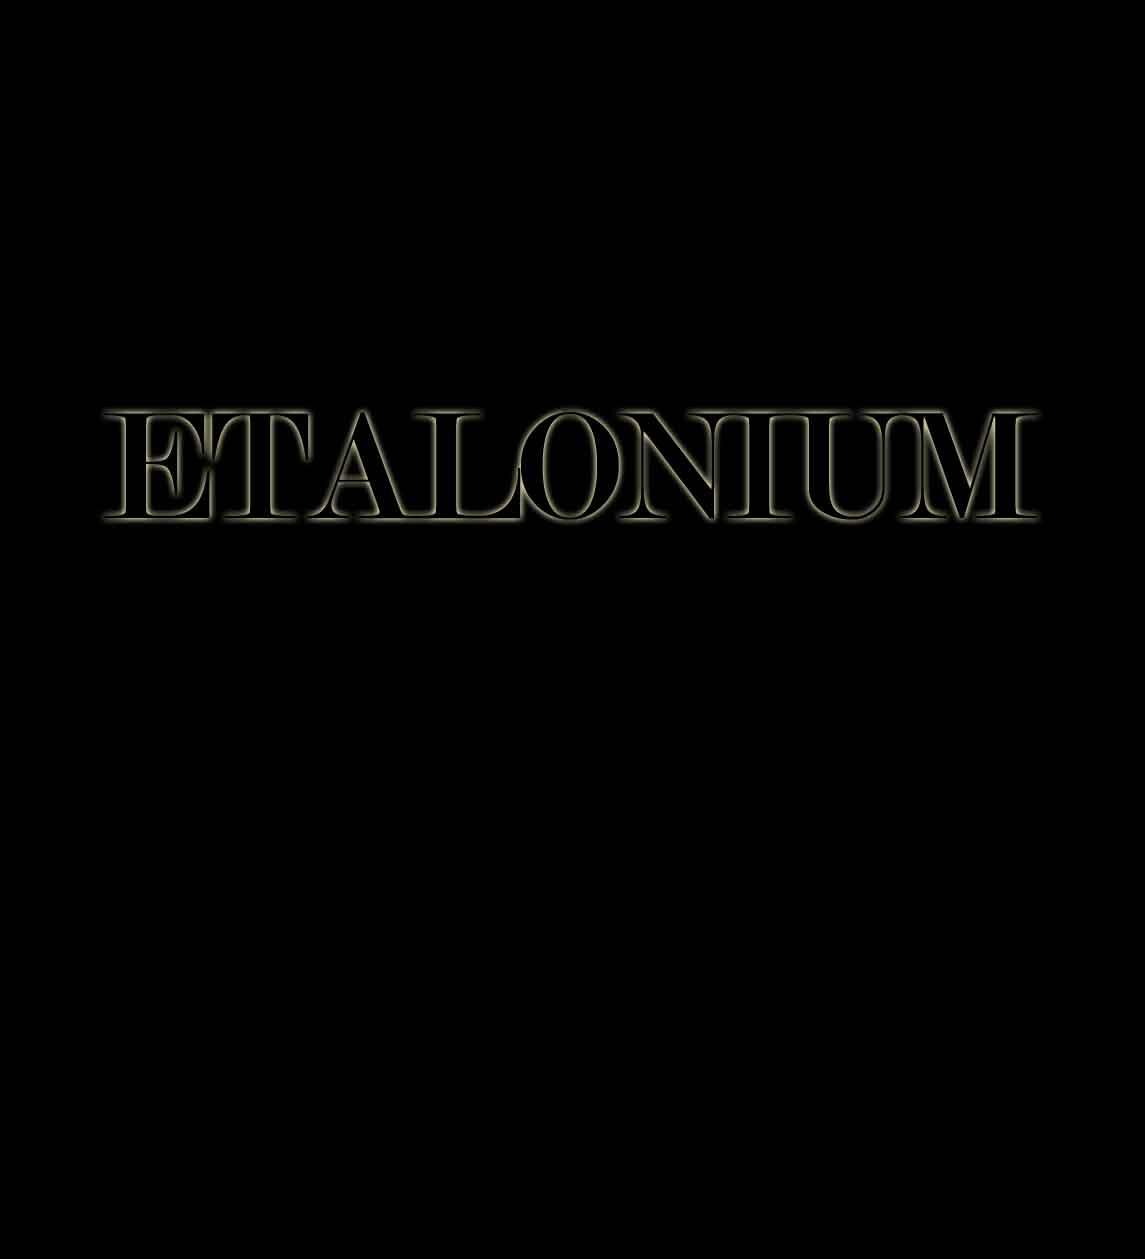 ETALONIUM